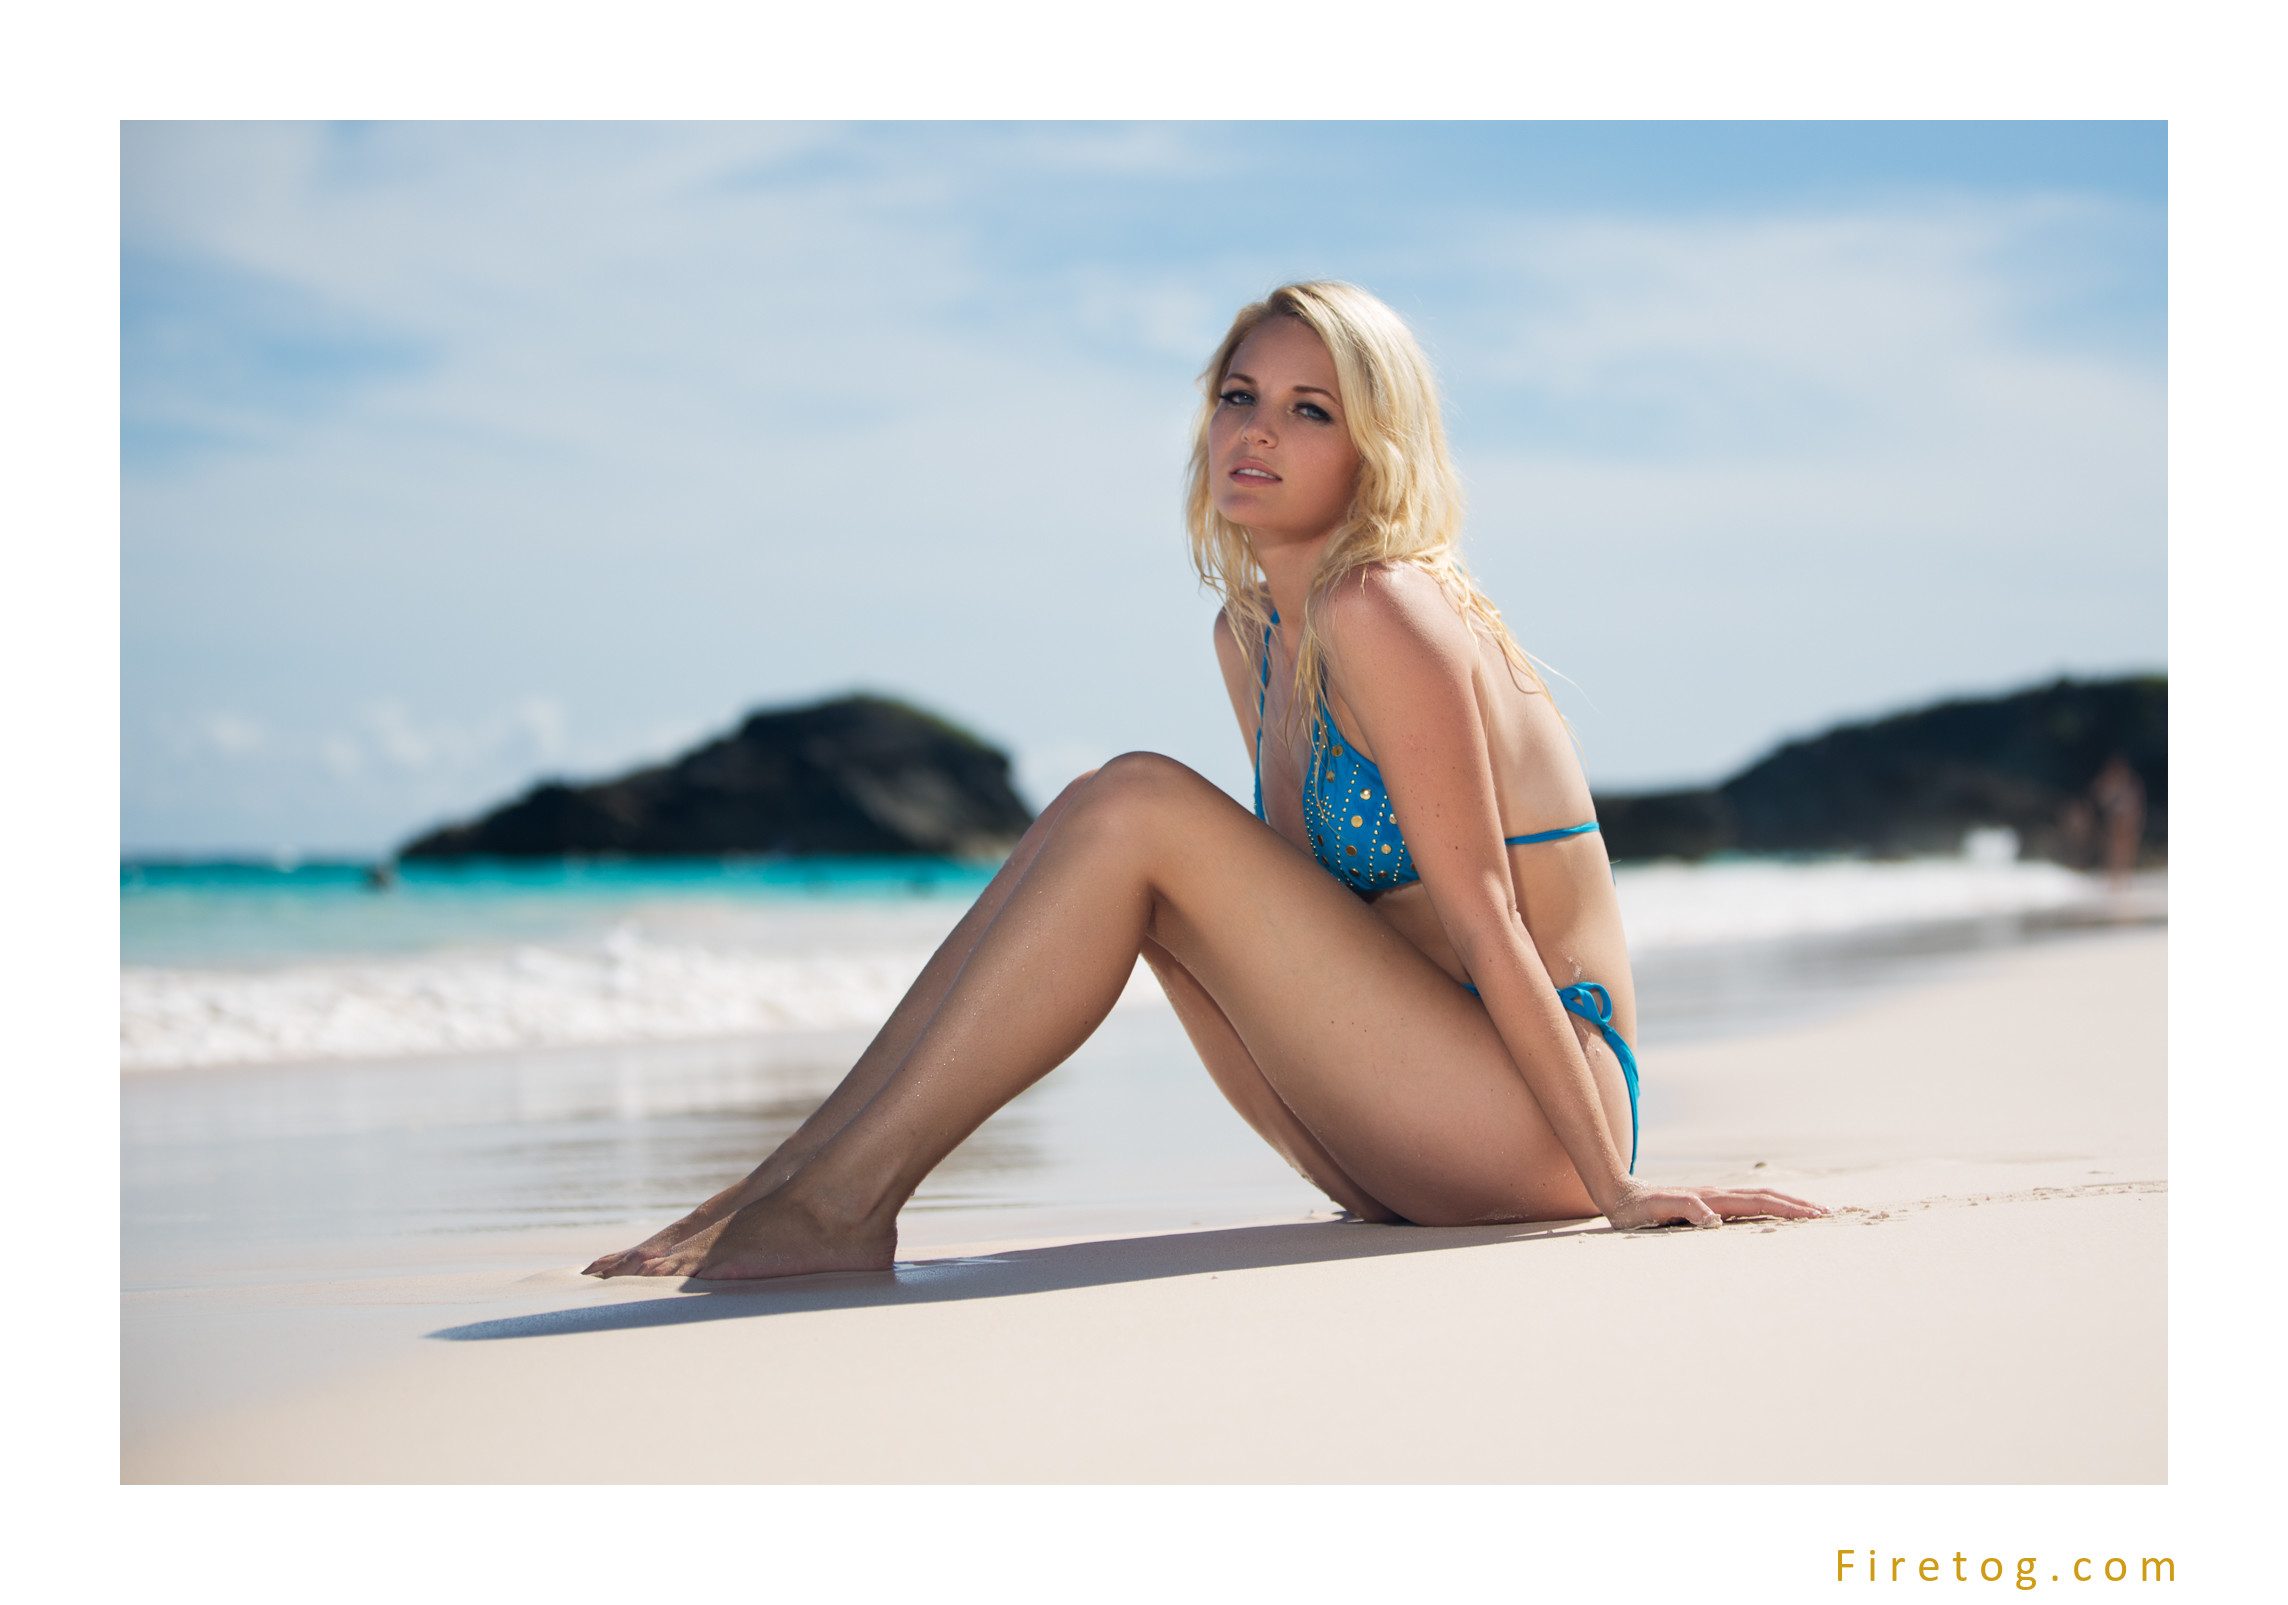 FireTog Photography